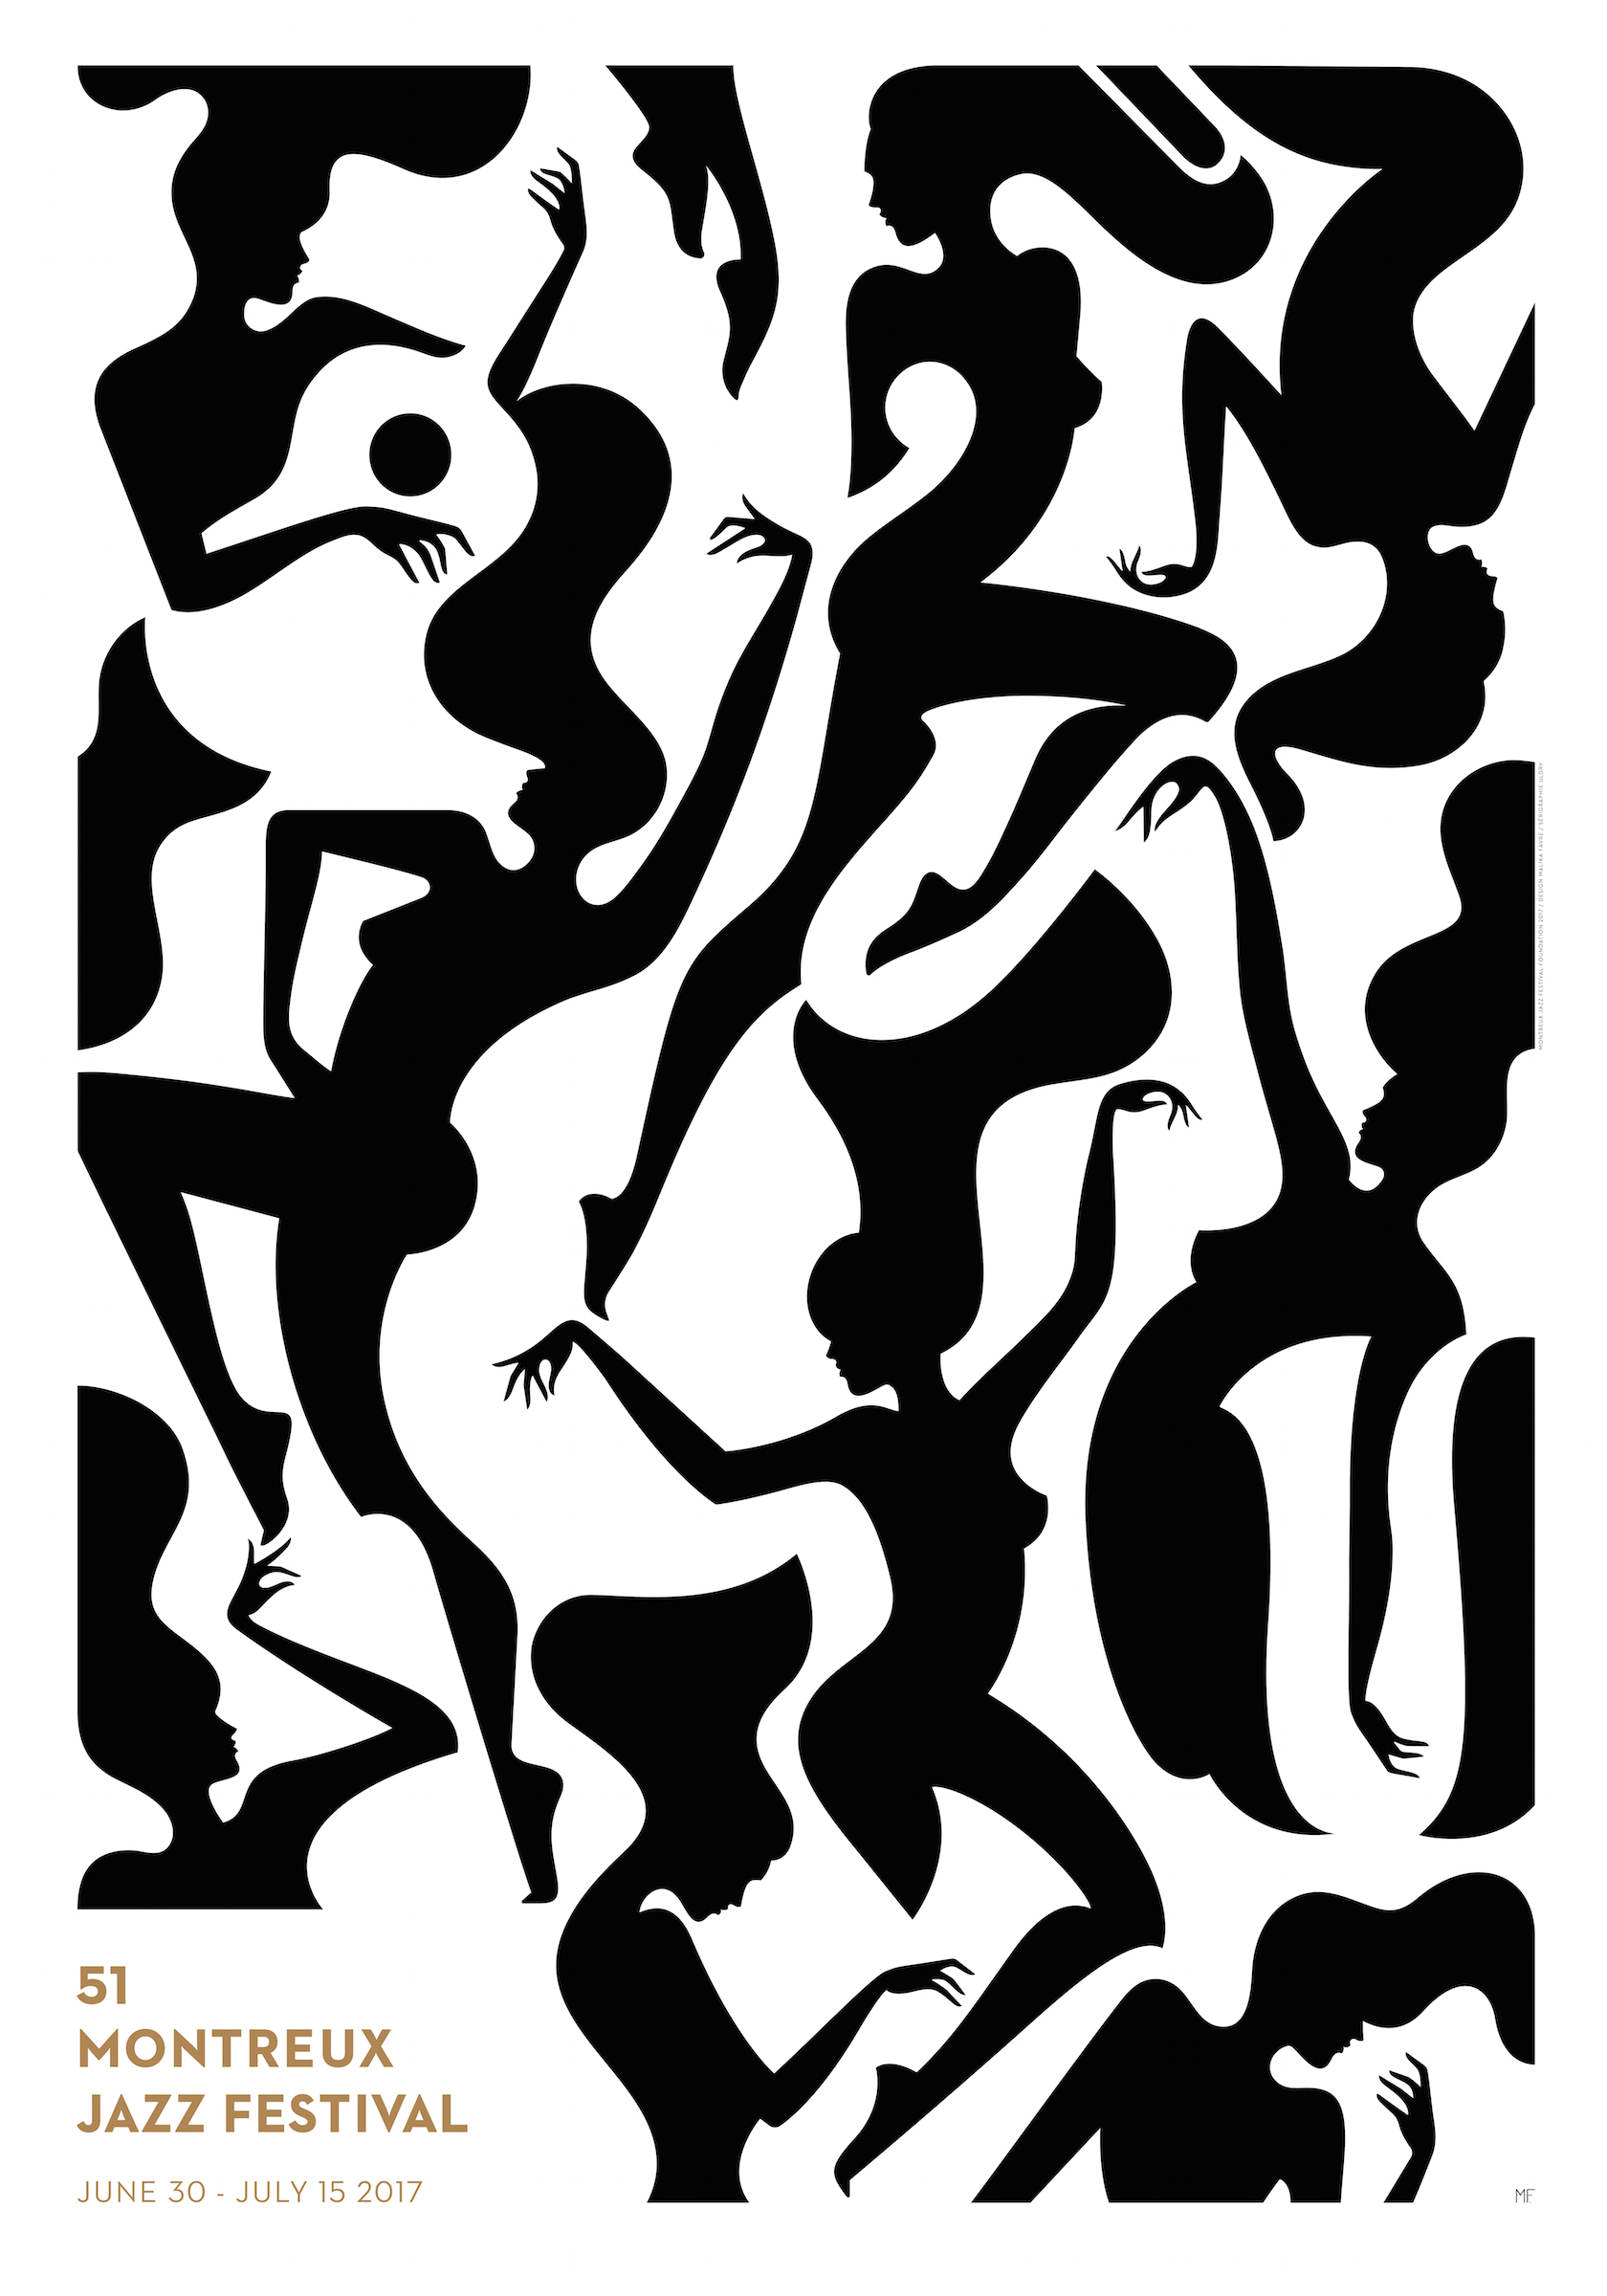 Montreux Jazz Festival >> 51st Montreux Jazz Festival Poster Unveiled Jazziz Magazine